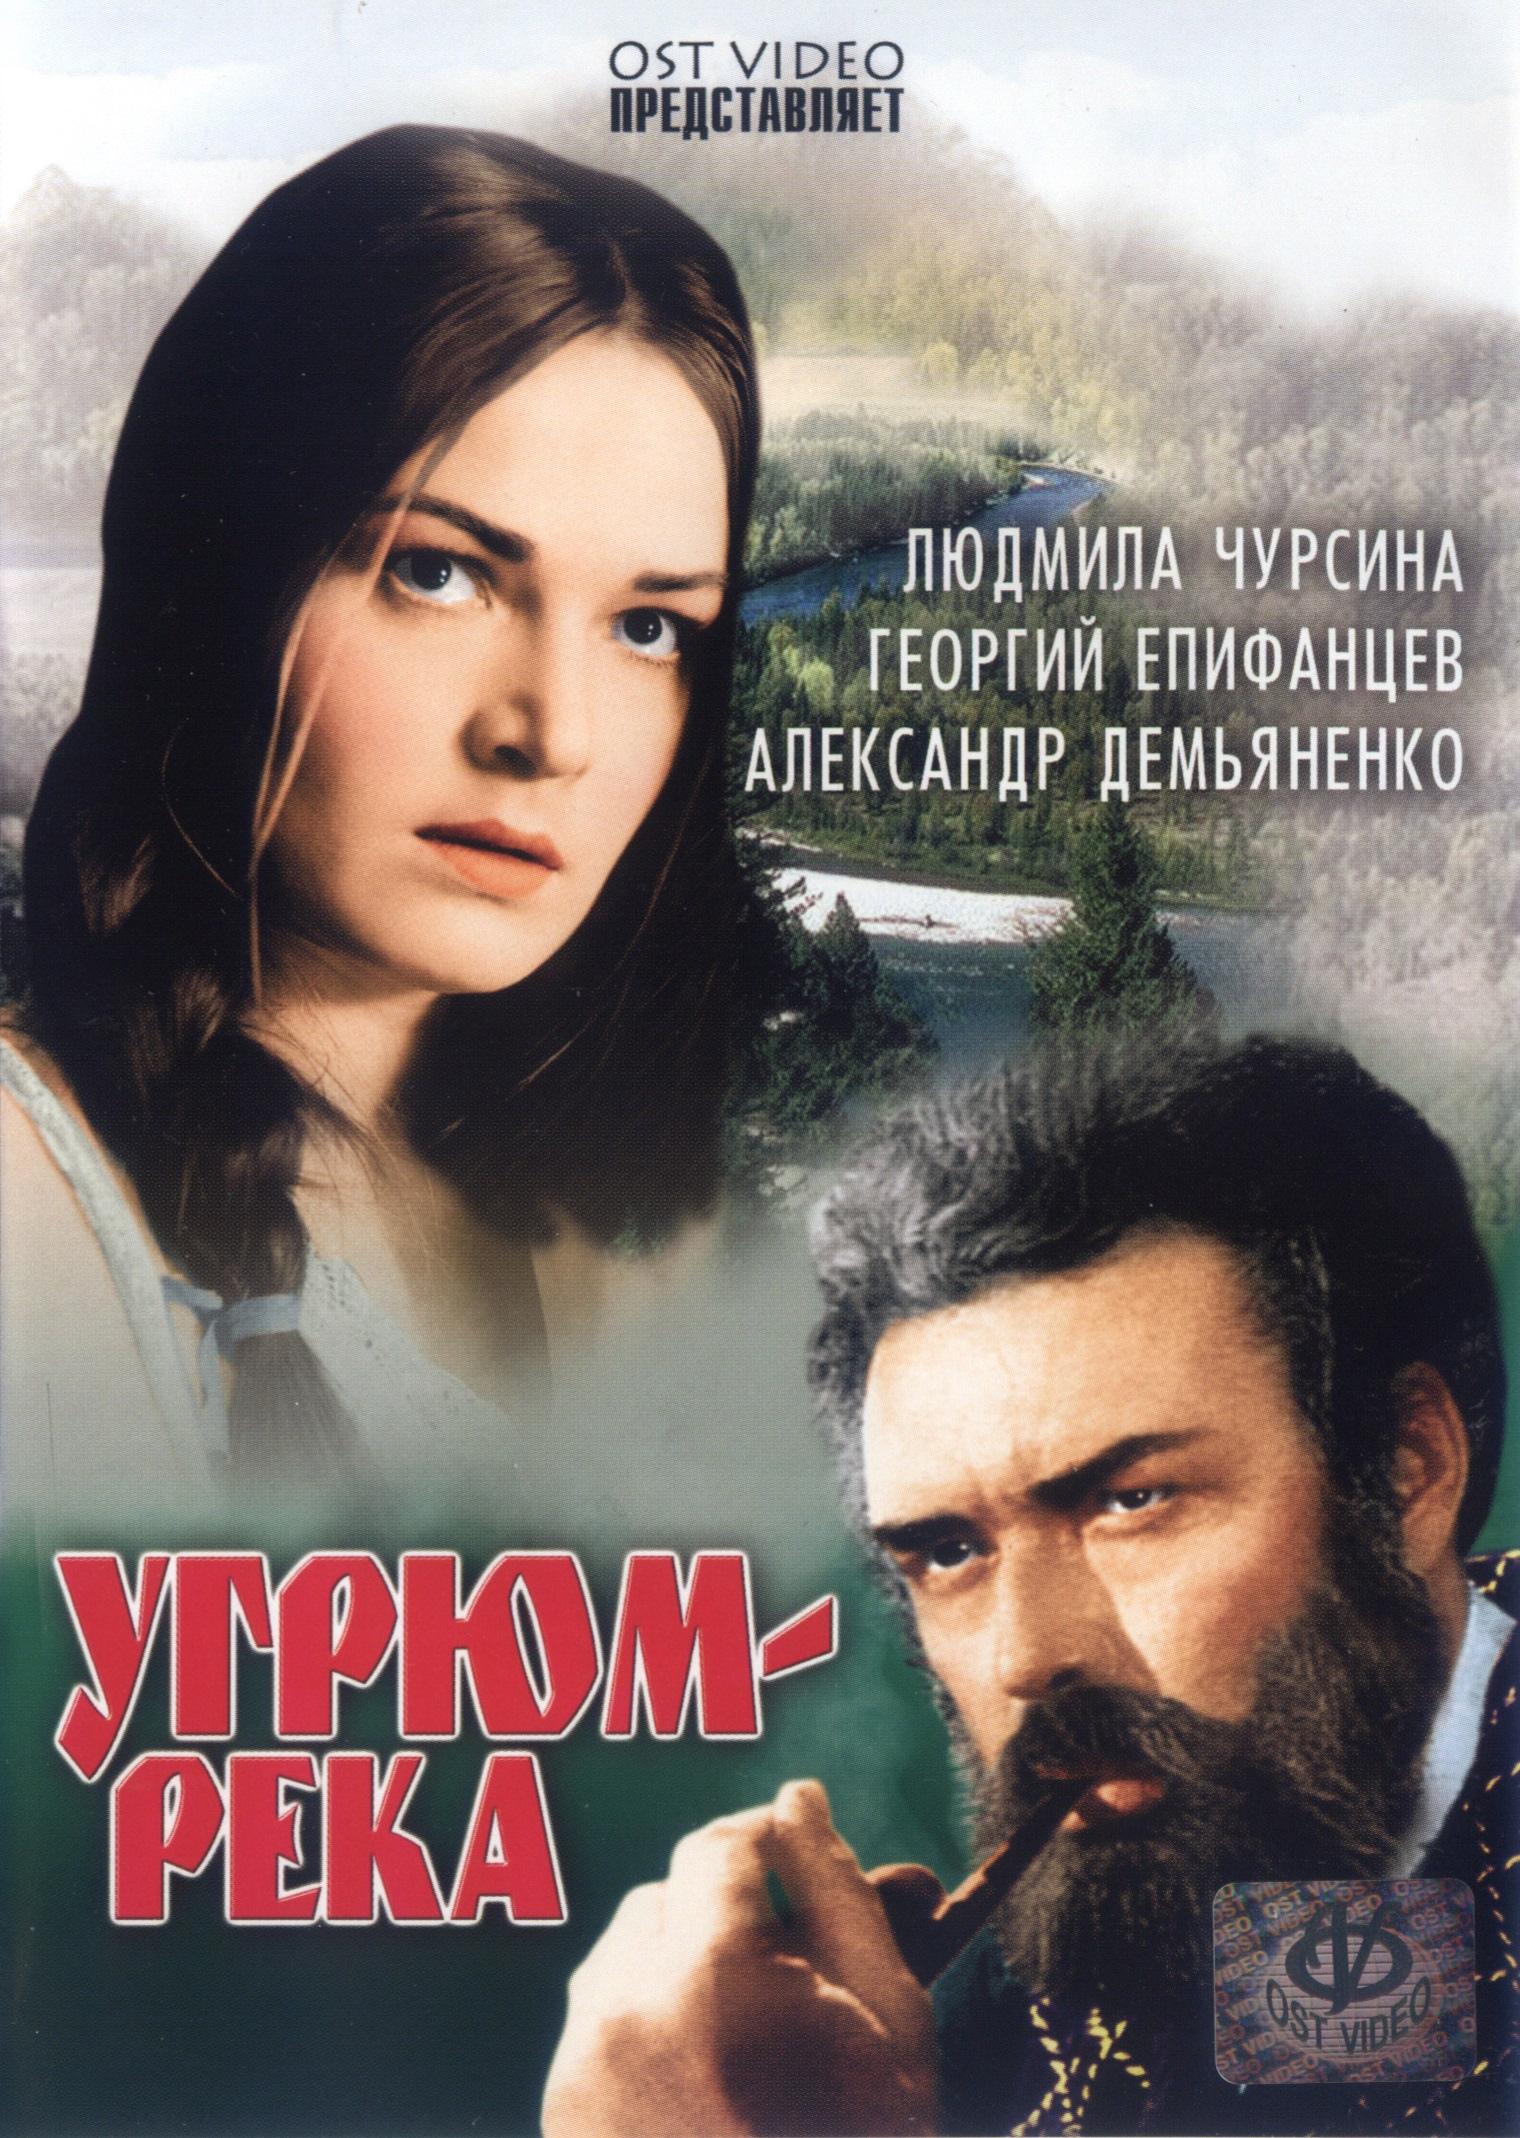 Драма «Угpюм-peкa» (1968) 1-4 серия из 4